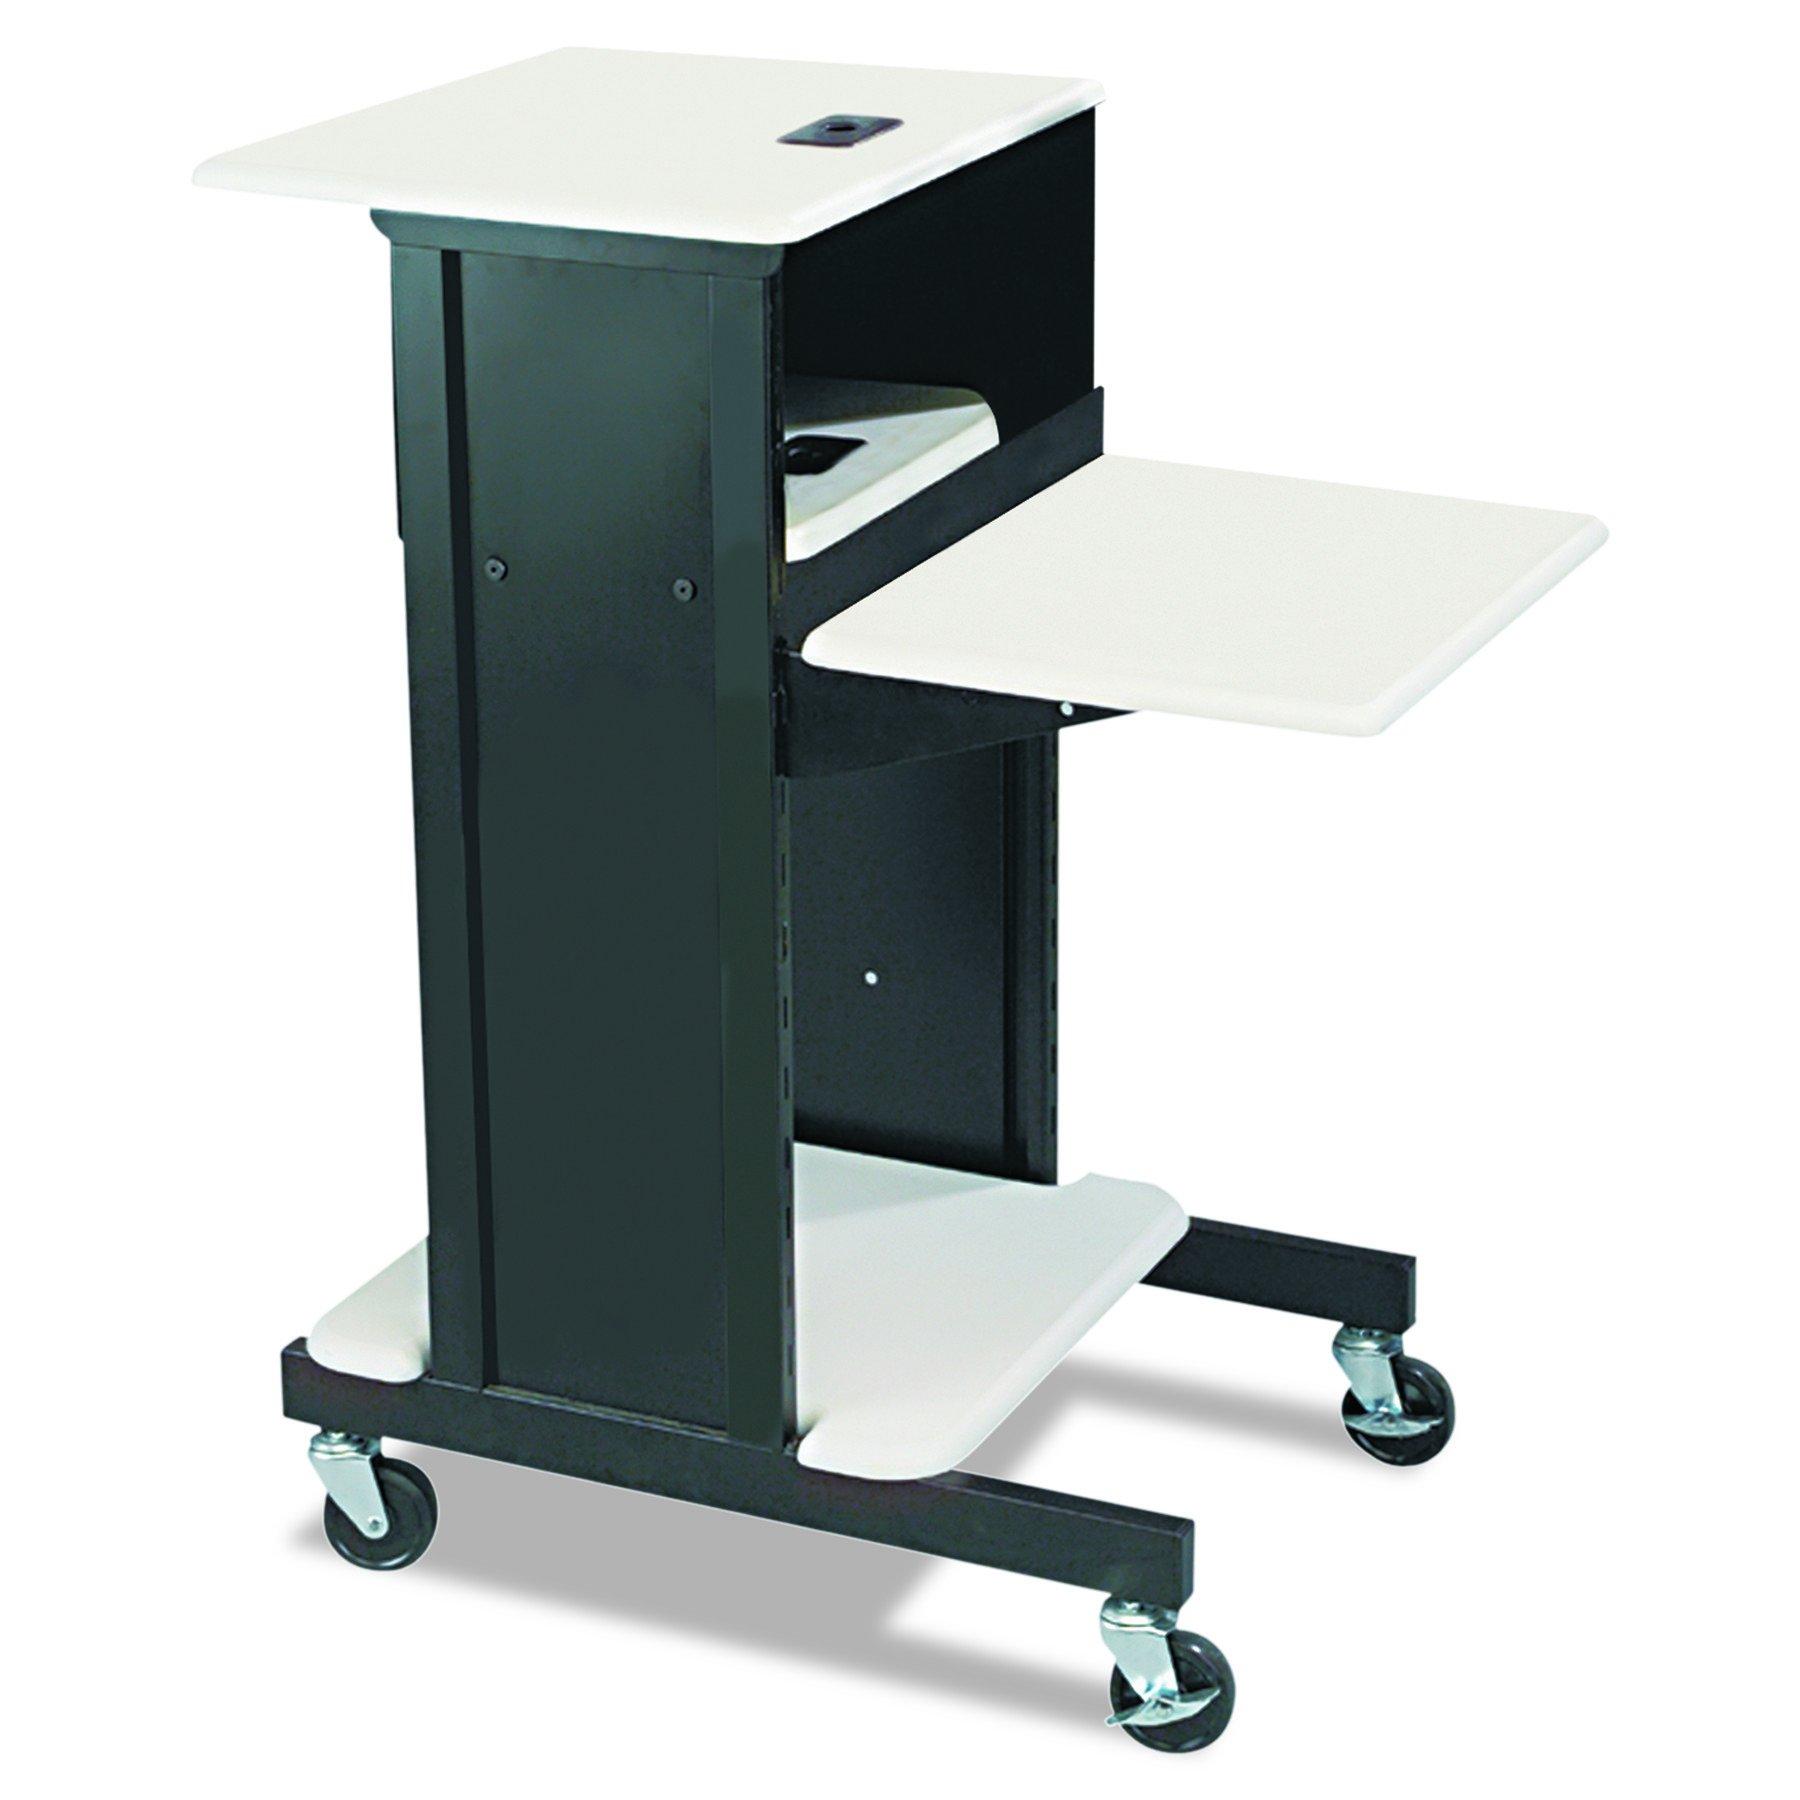 BALT 89759 Adjustable Presentation Cart, 18w x 30d x 40-1/4h, Black/Gray by Balt (Image #1)